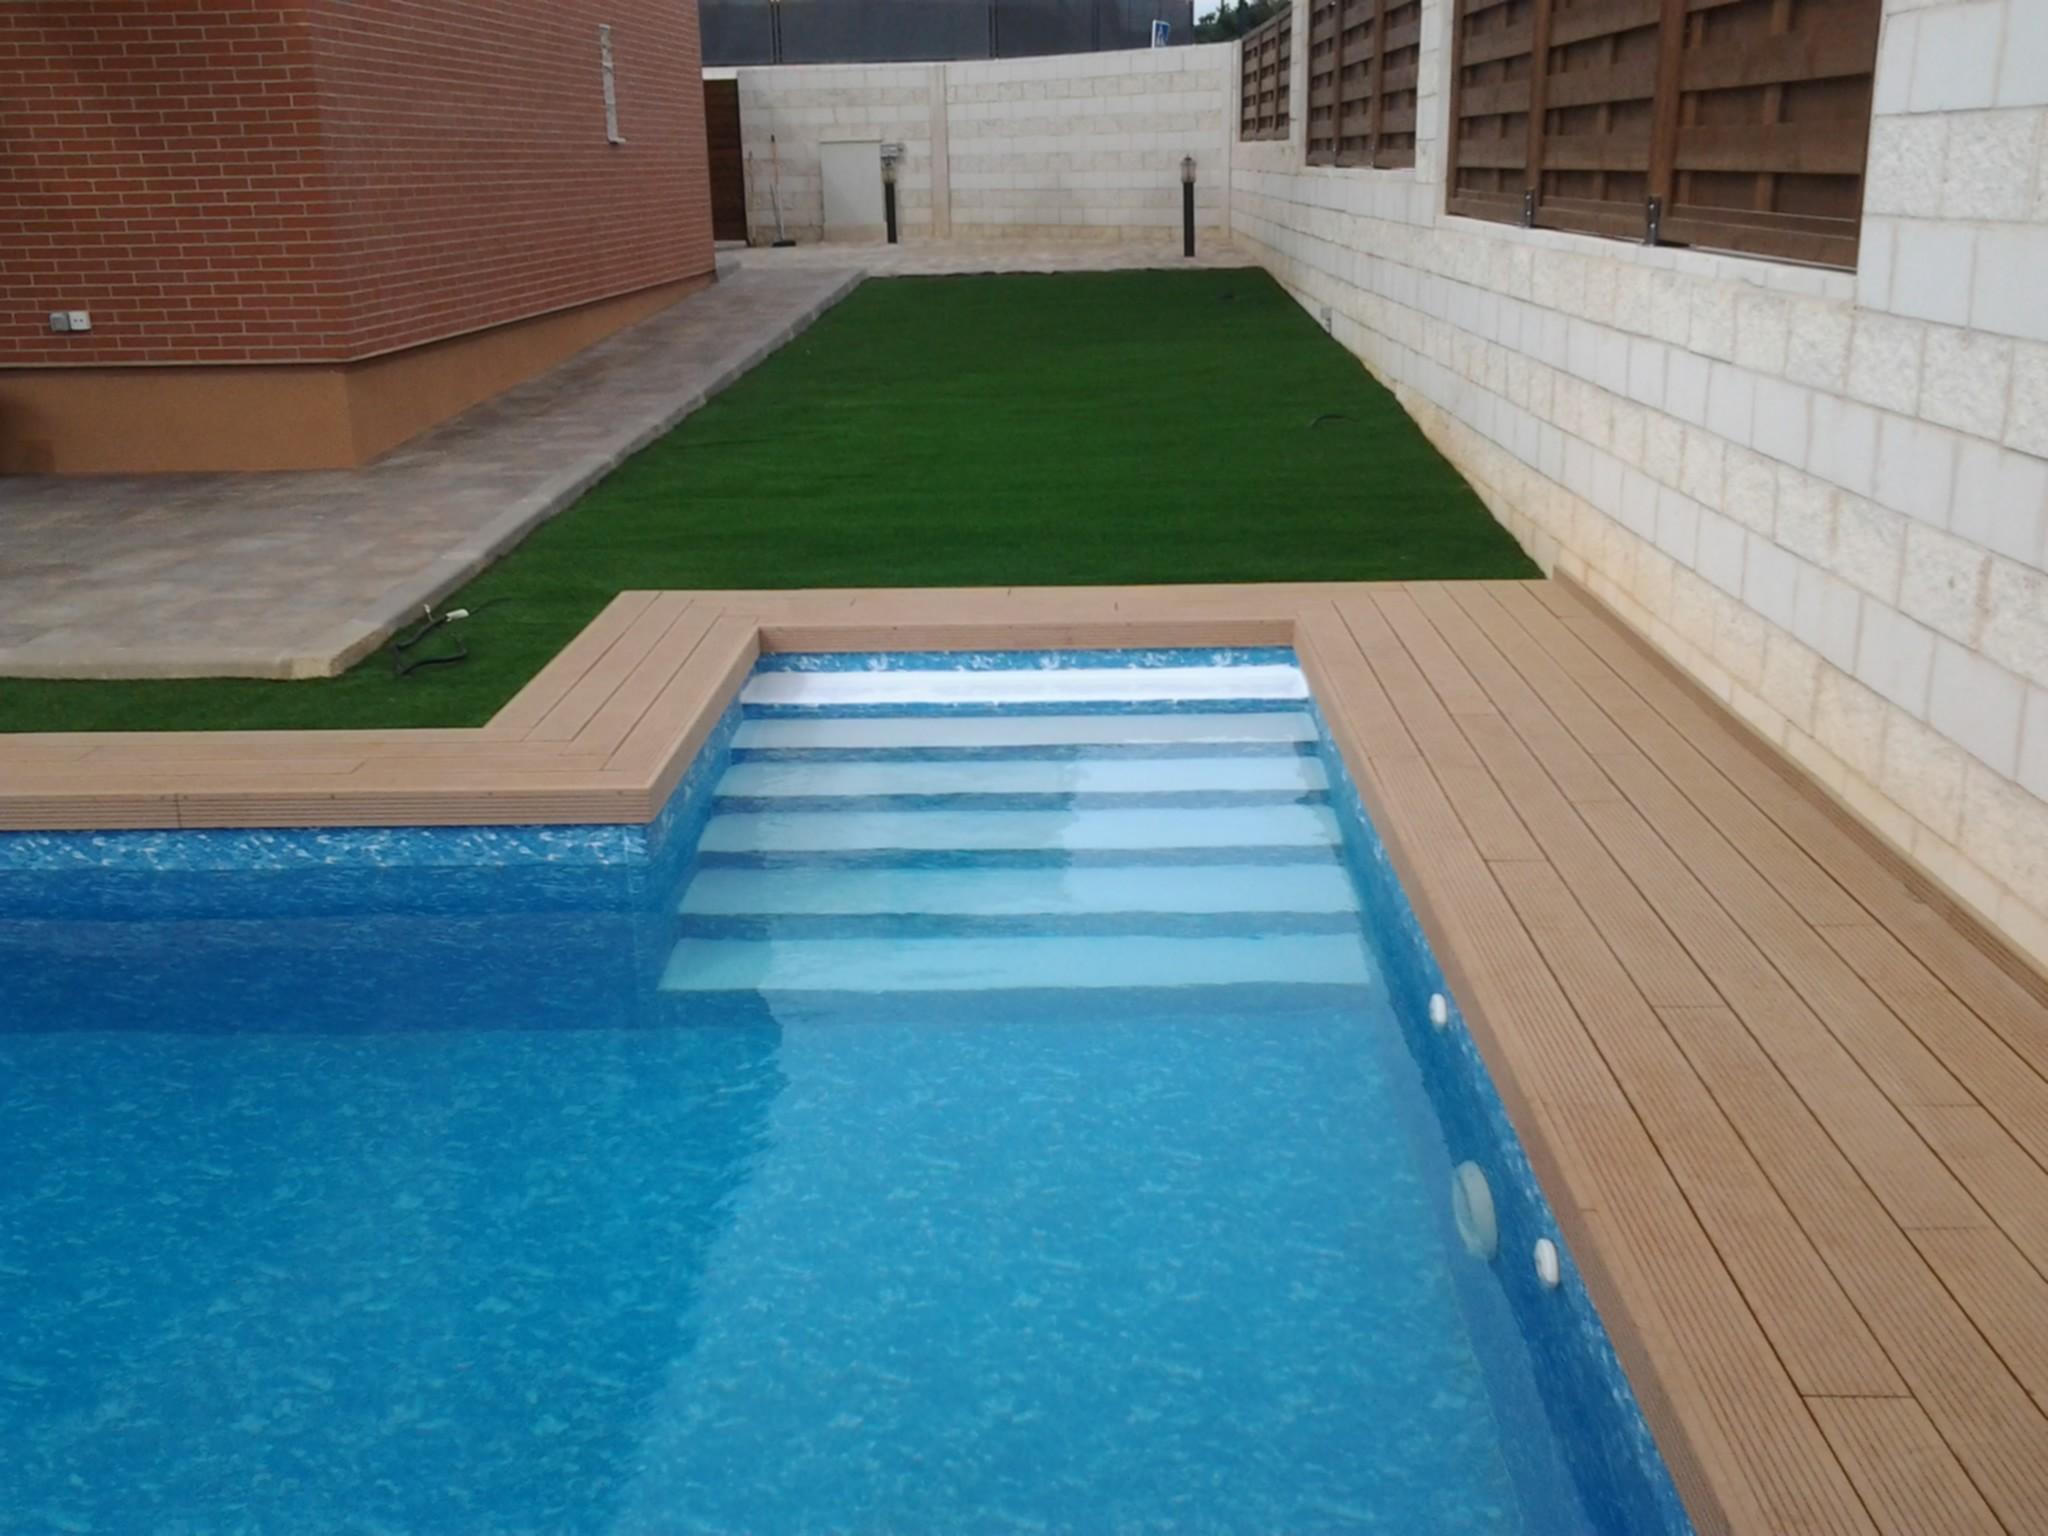 Bordes de piscina indeformables de madera sint tica for Piscinas exteriores